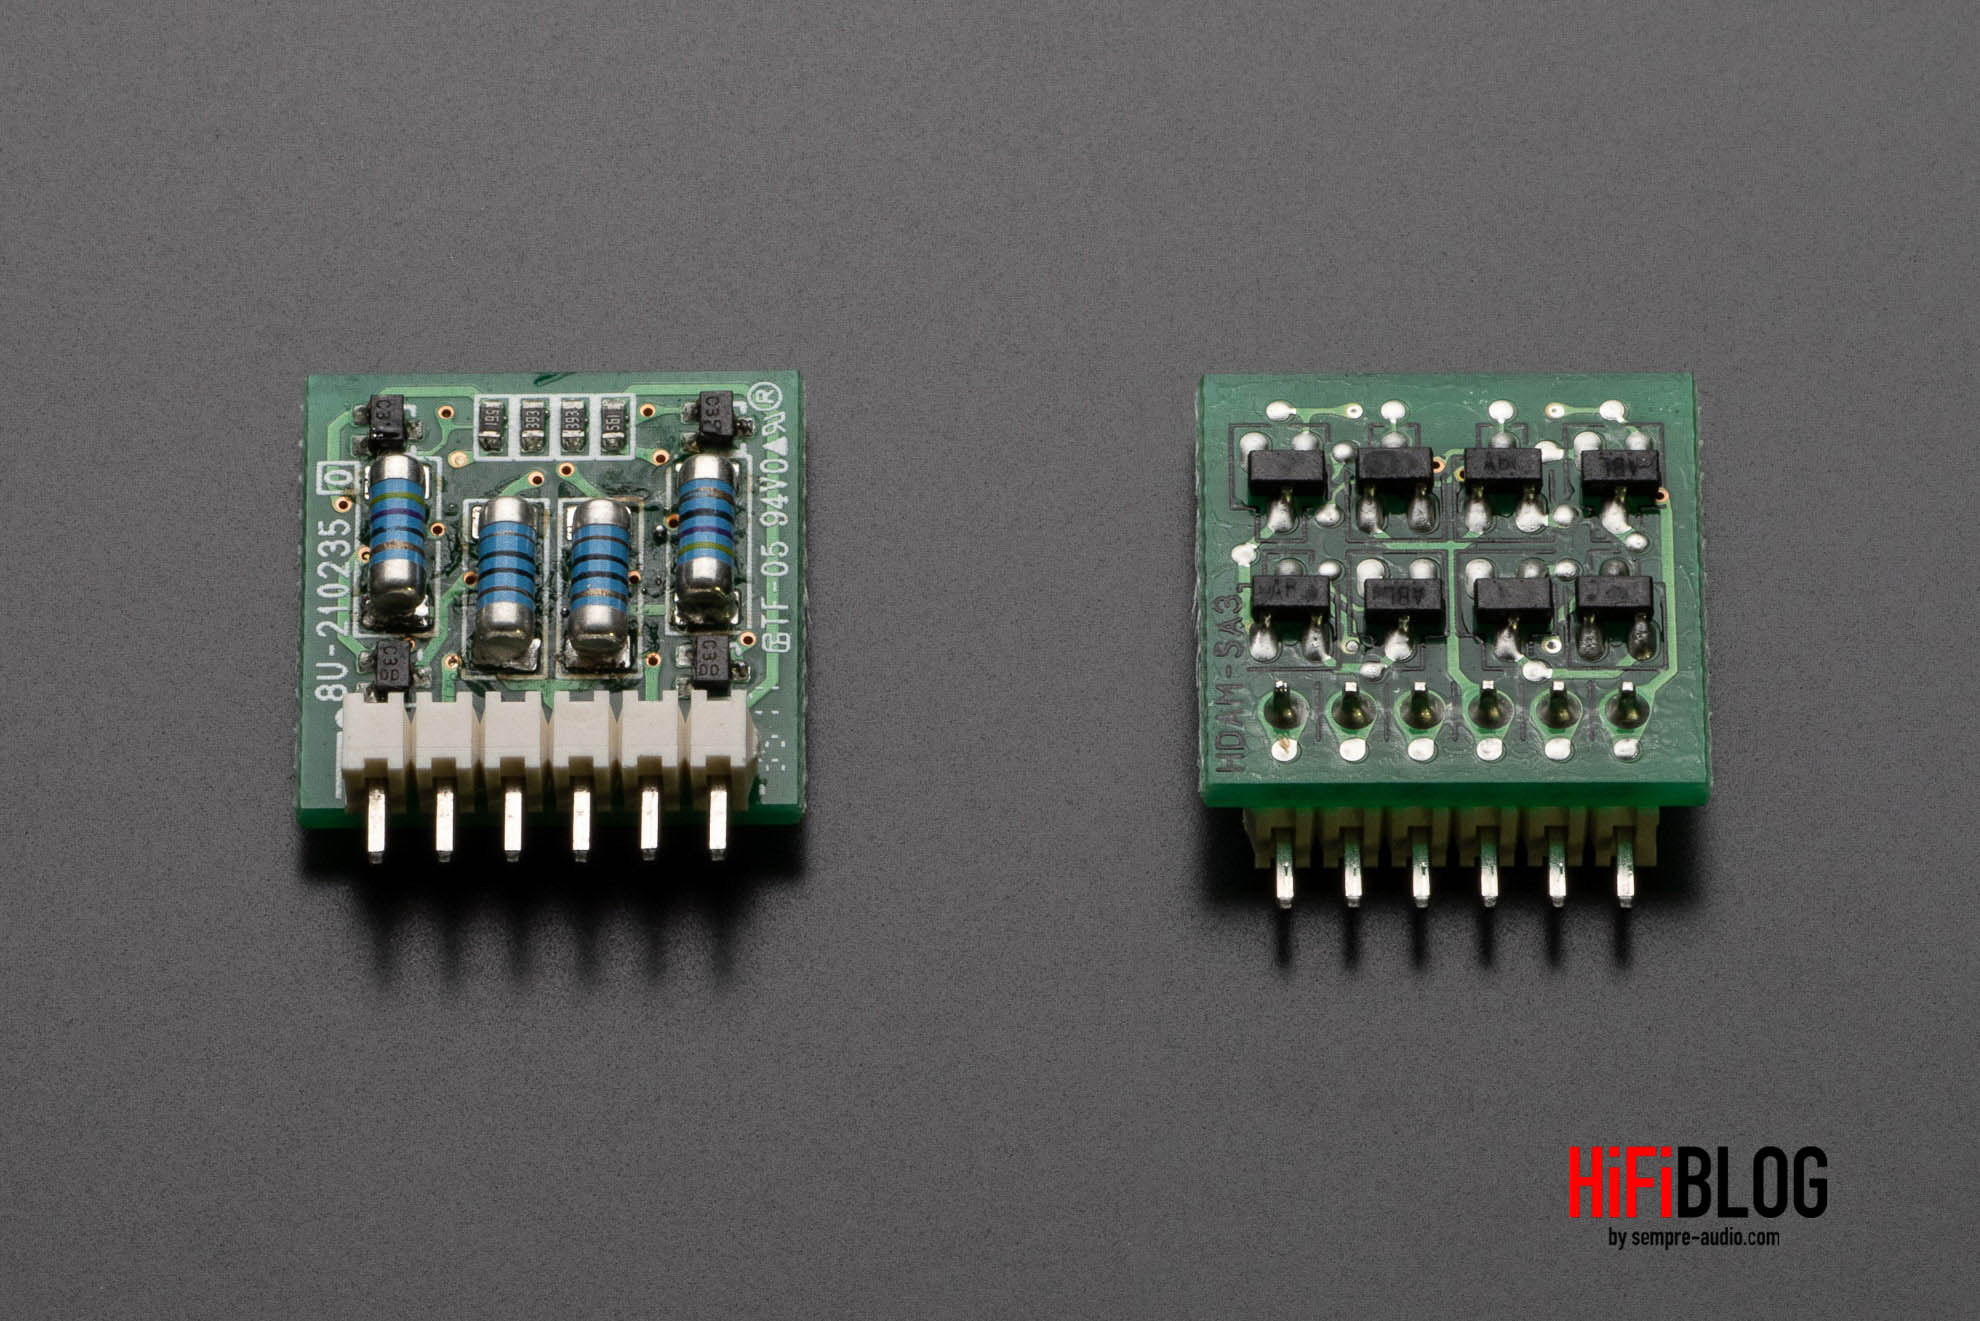 Marantz Model 30 Integrated Amplifier and SACD 30n Network SACD Player 18